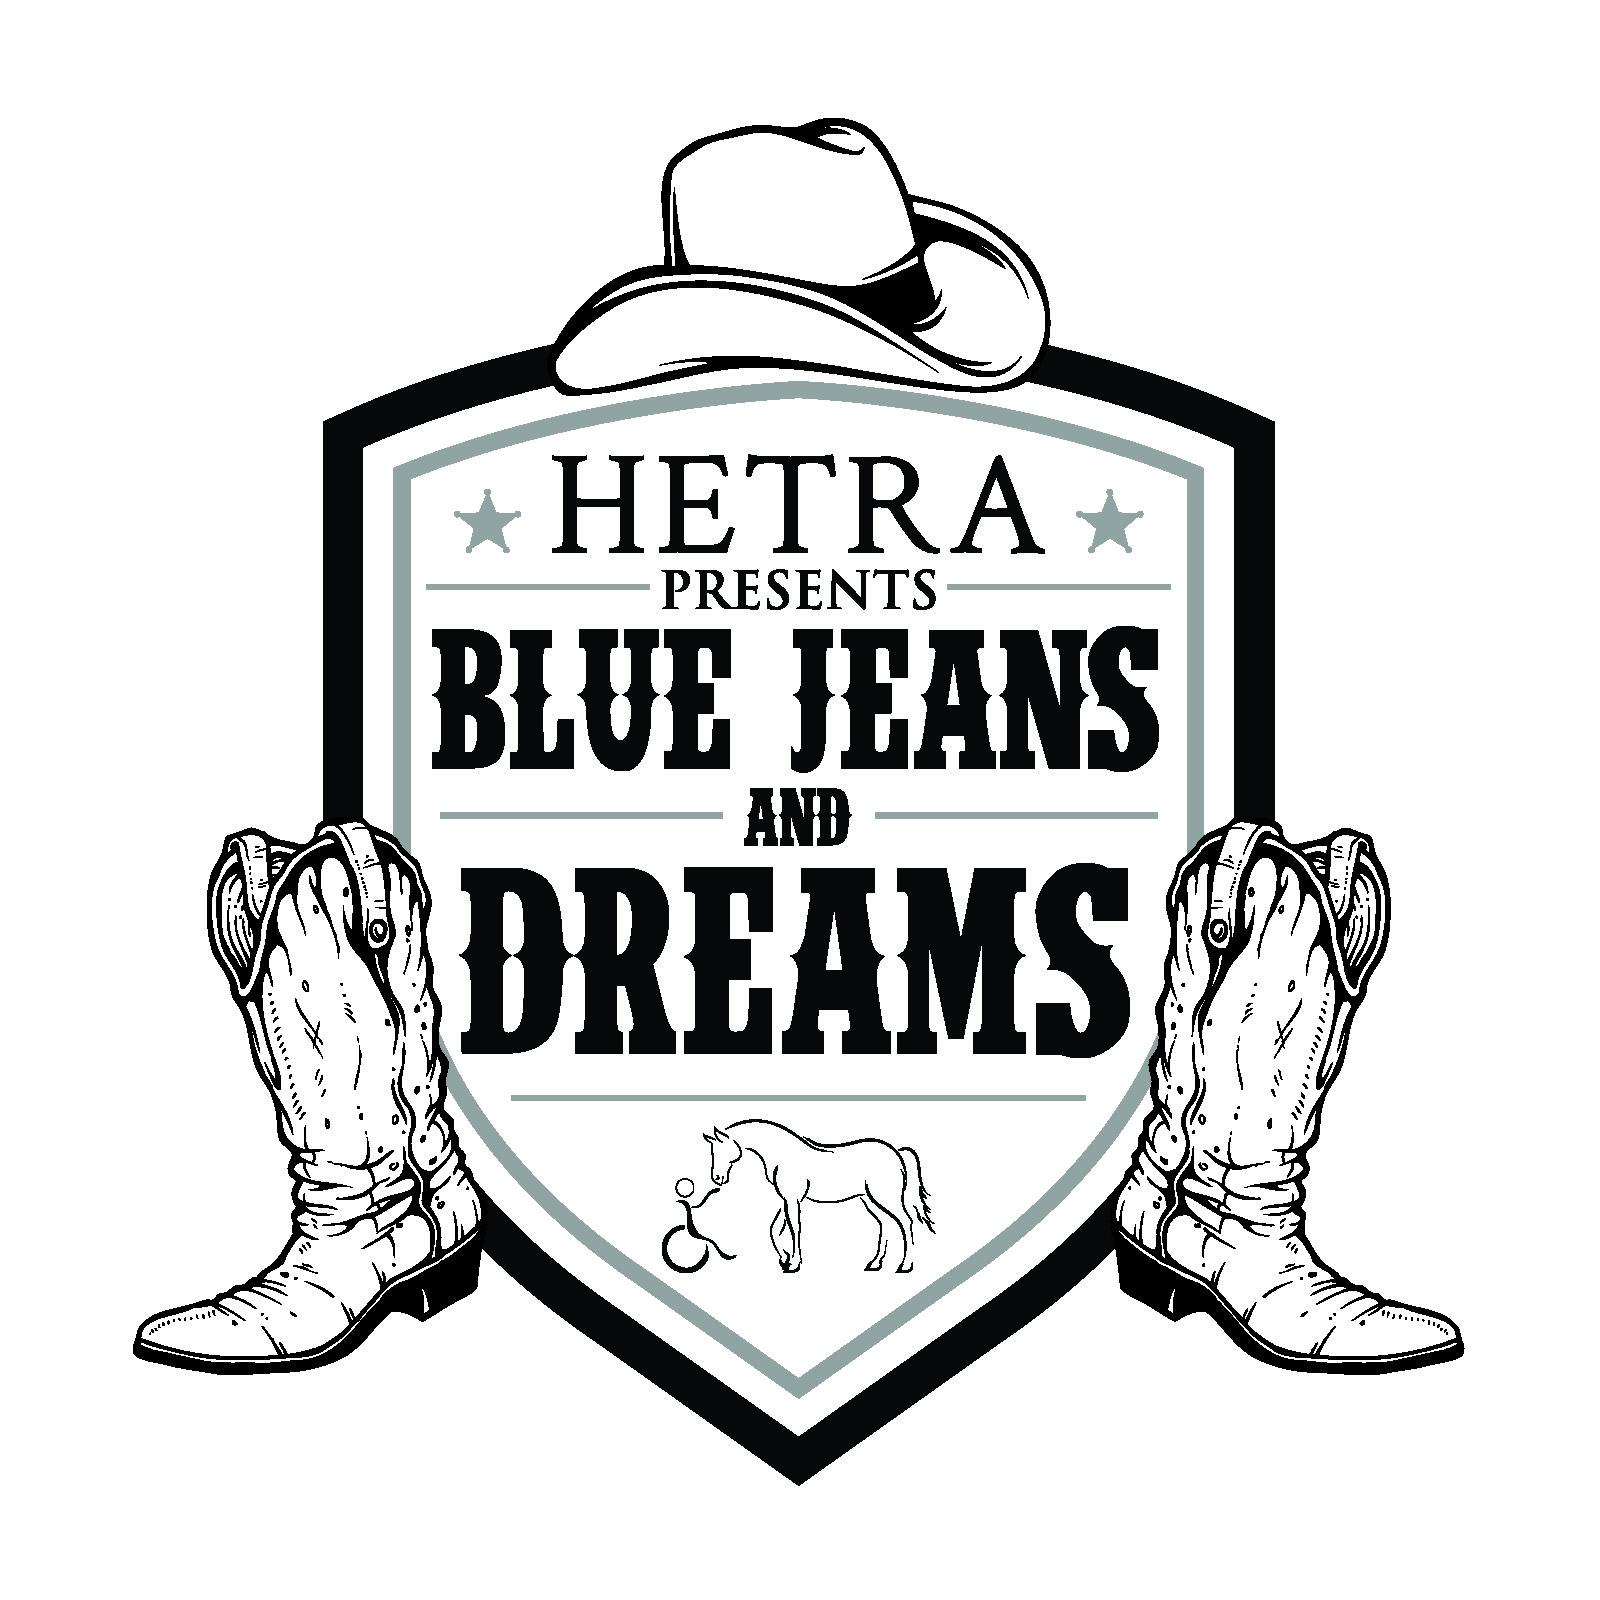 2020 Blue Jeans & Dreams Sponsorship